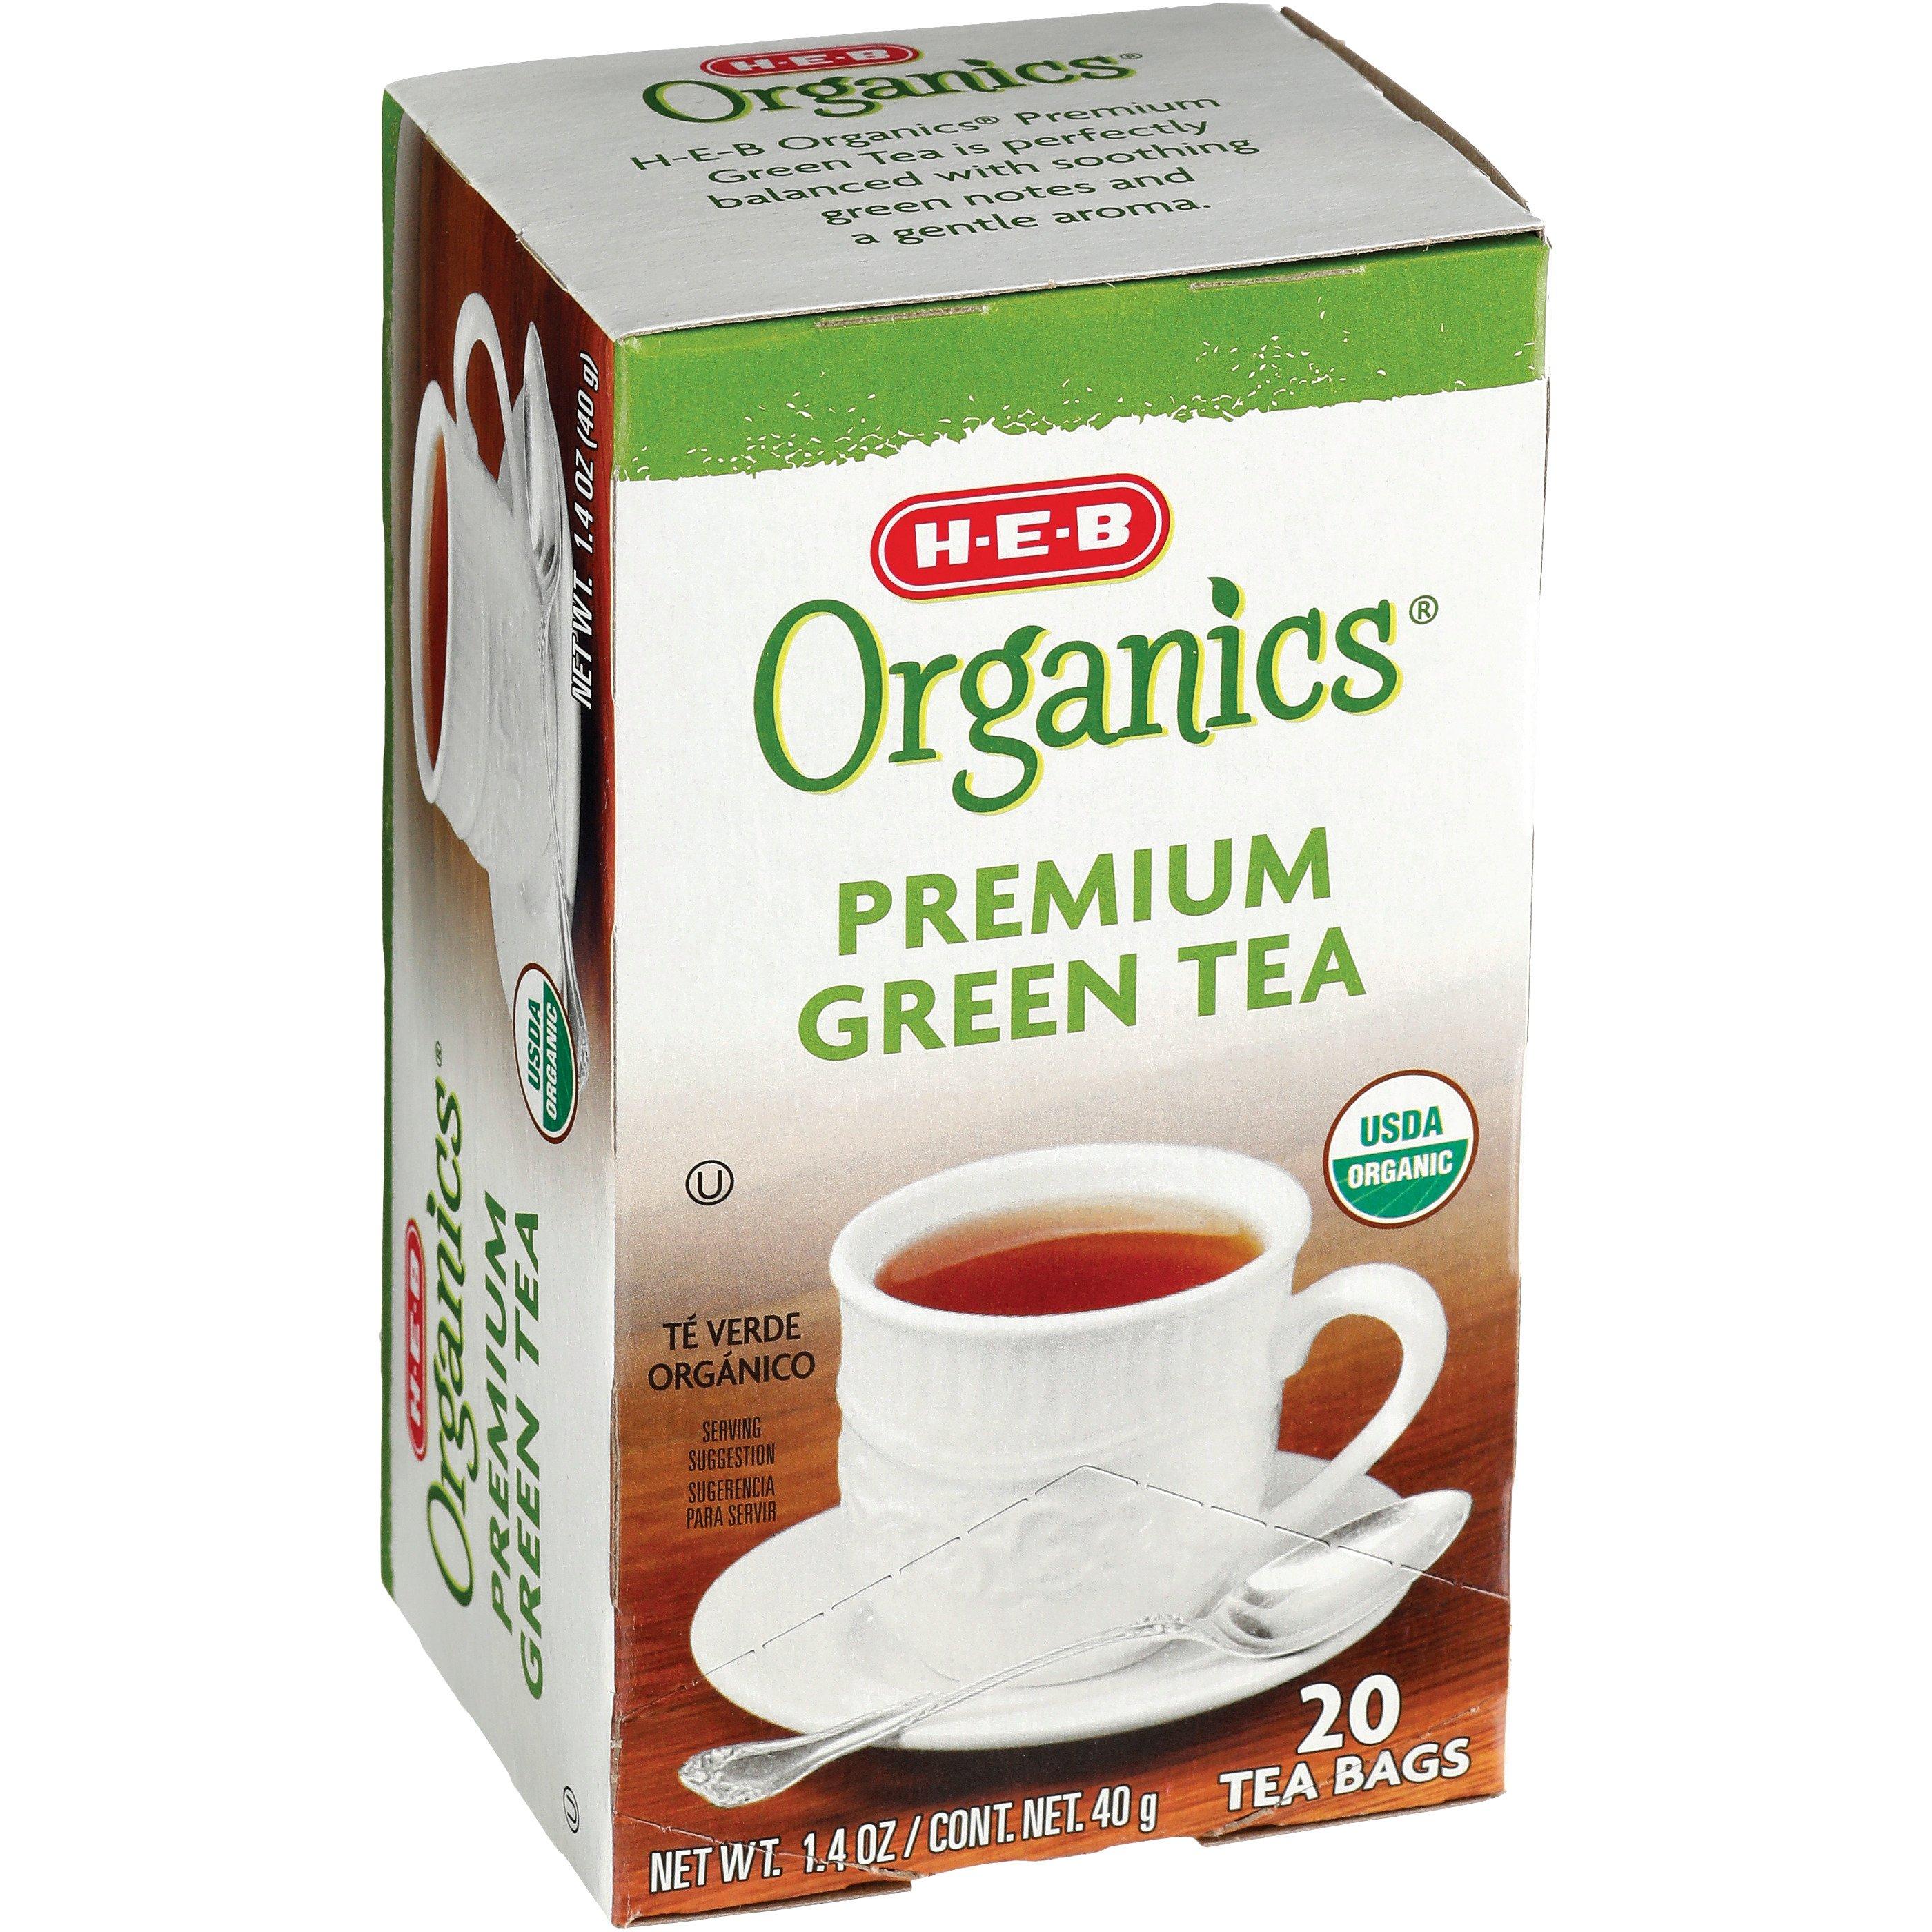 H‑E‑B Organics Premium Green Tea ‑ Shop Tea at H‑E‑B